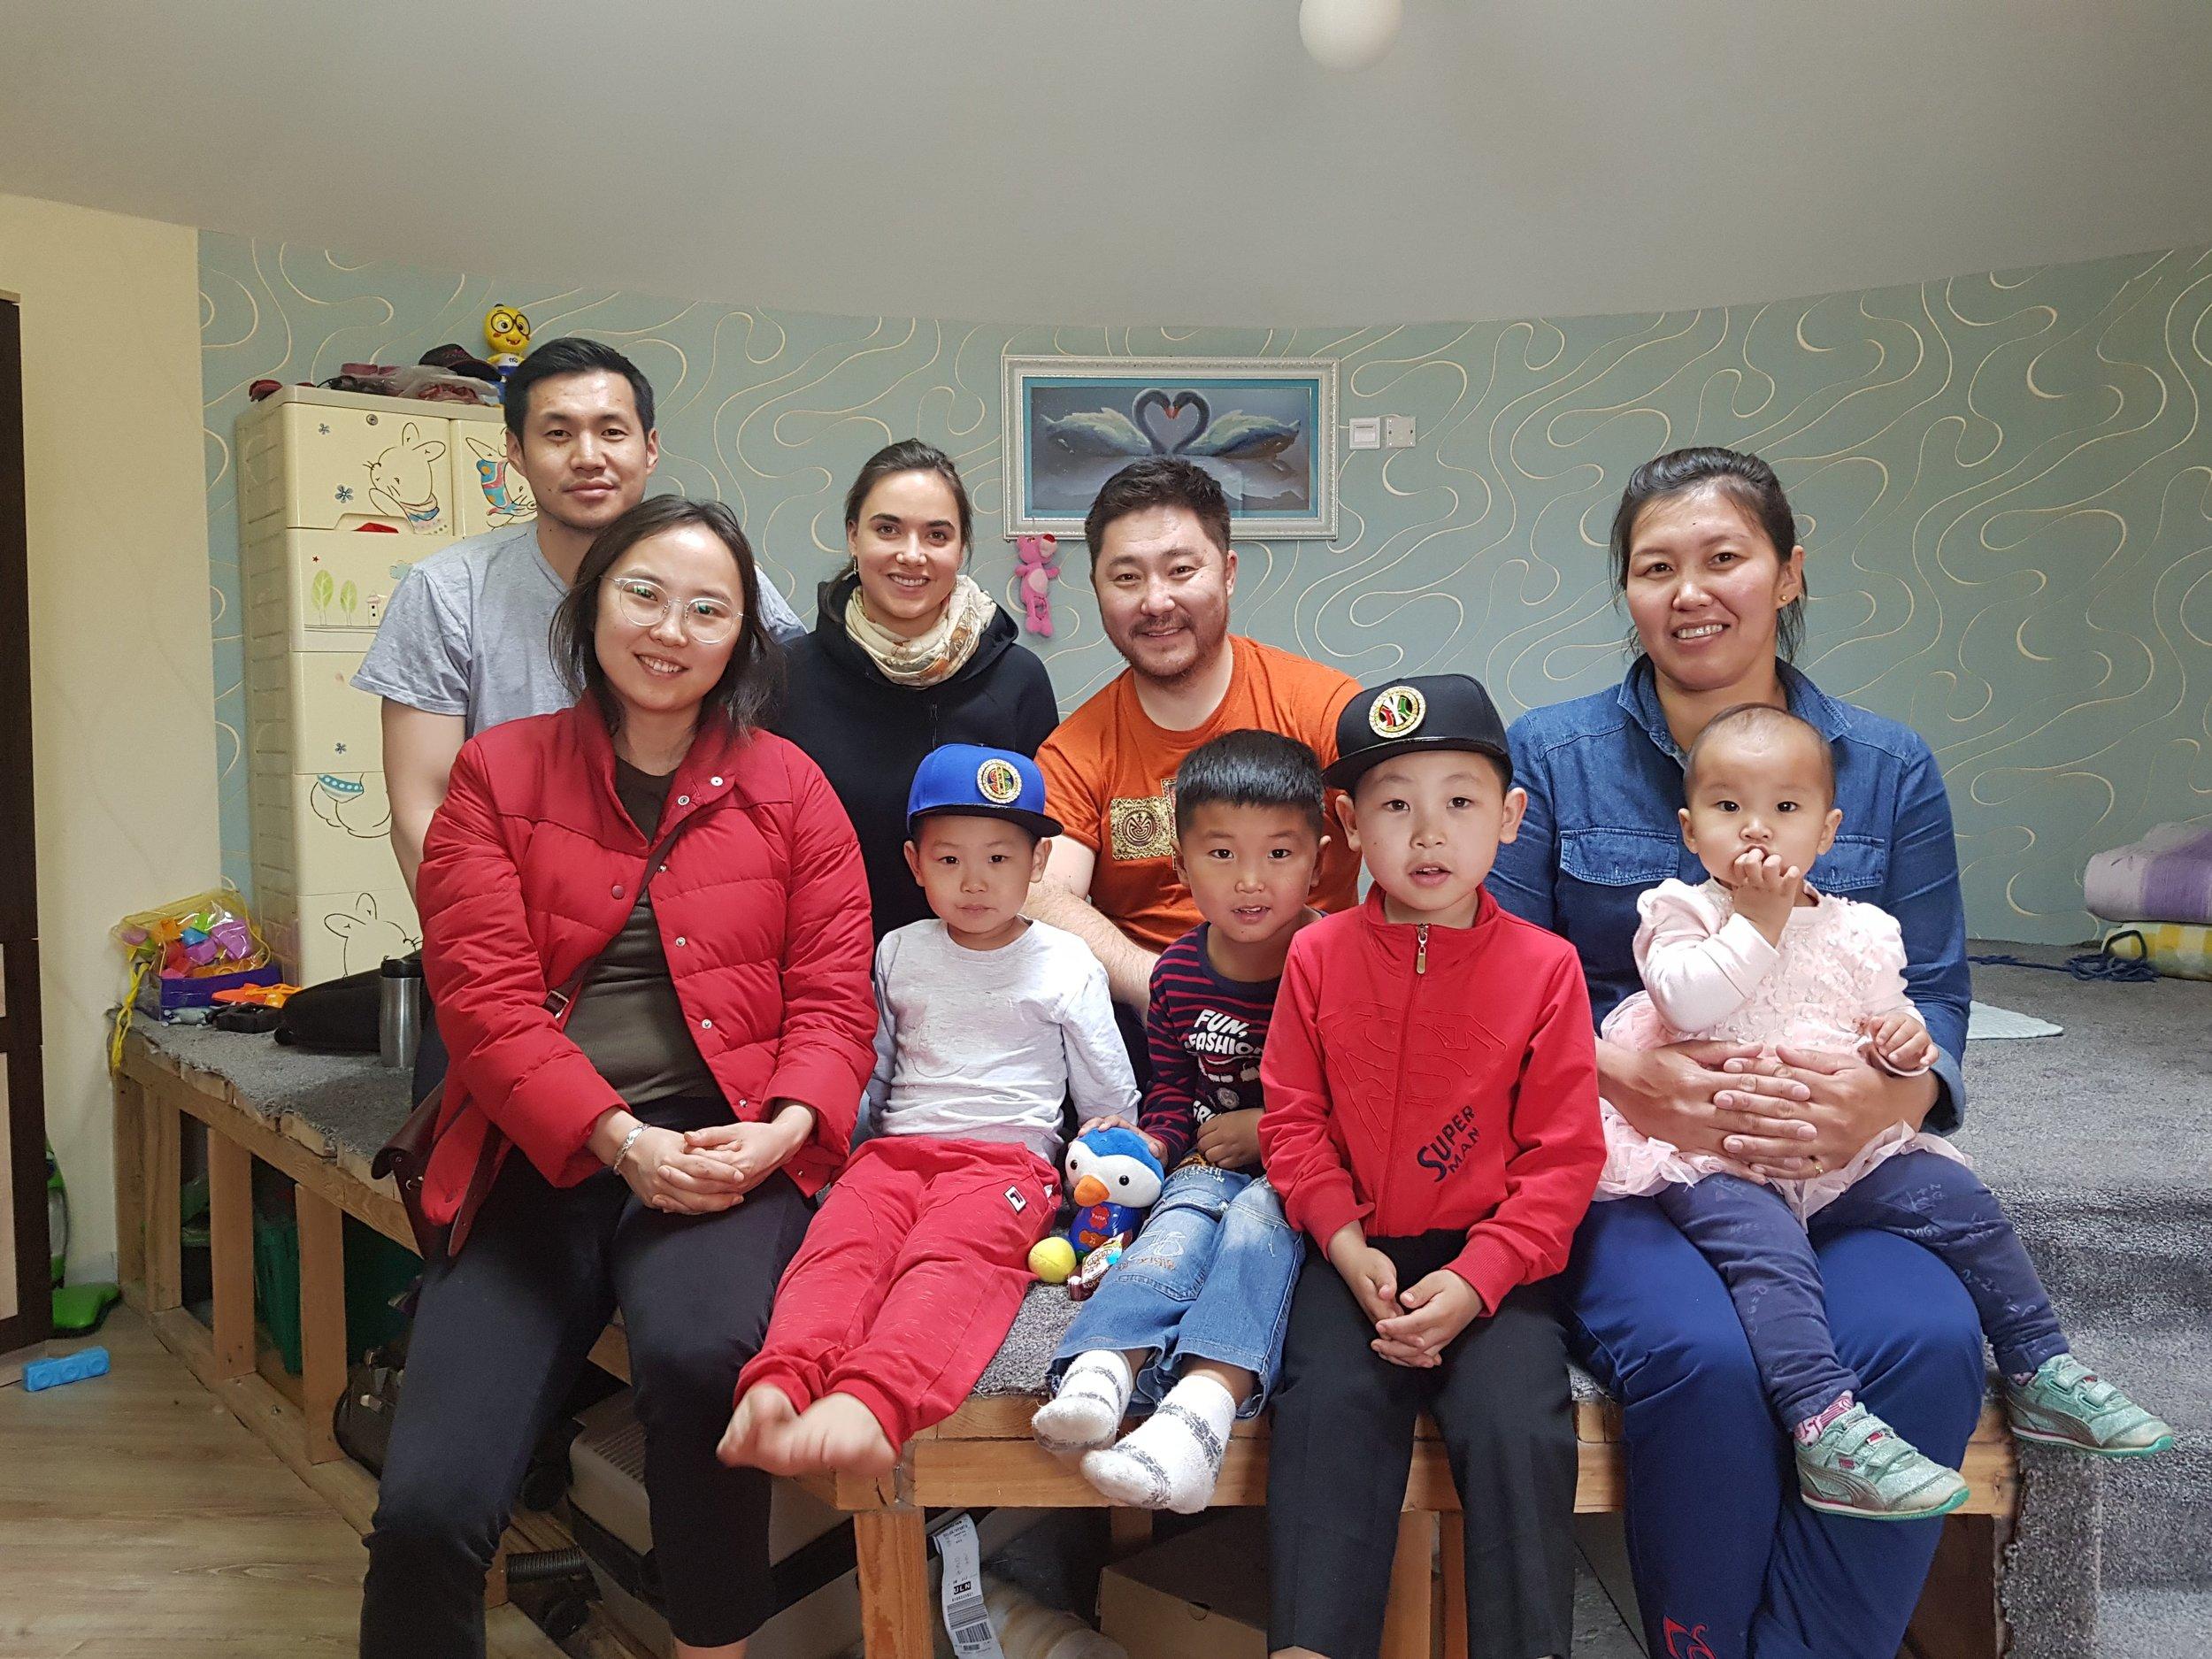 PASSIVE GER Interior / ПАССИВ ГЭР интерьер GerHub, EcoTown, Tuya, her kids and nephews